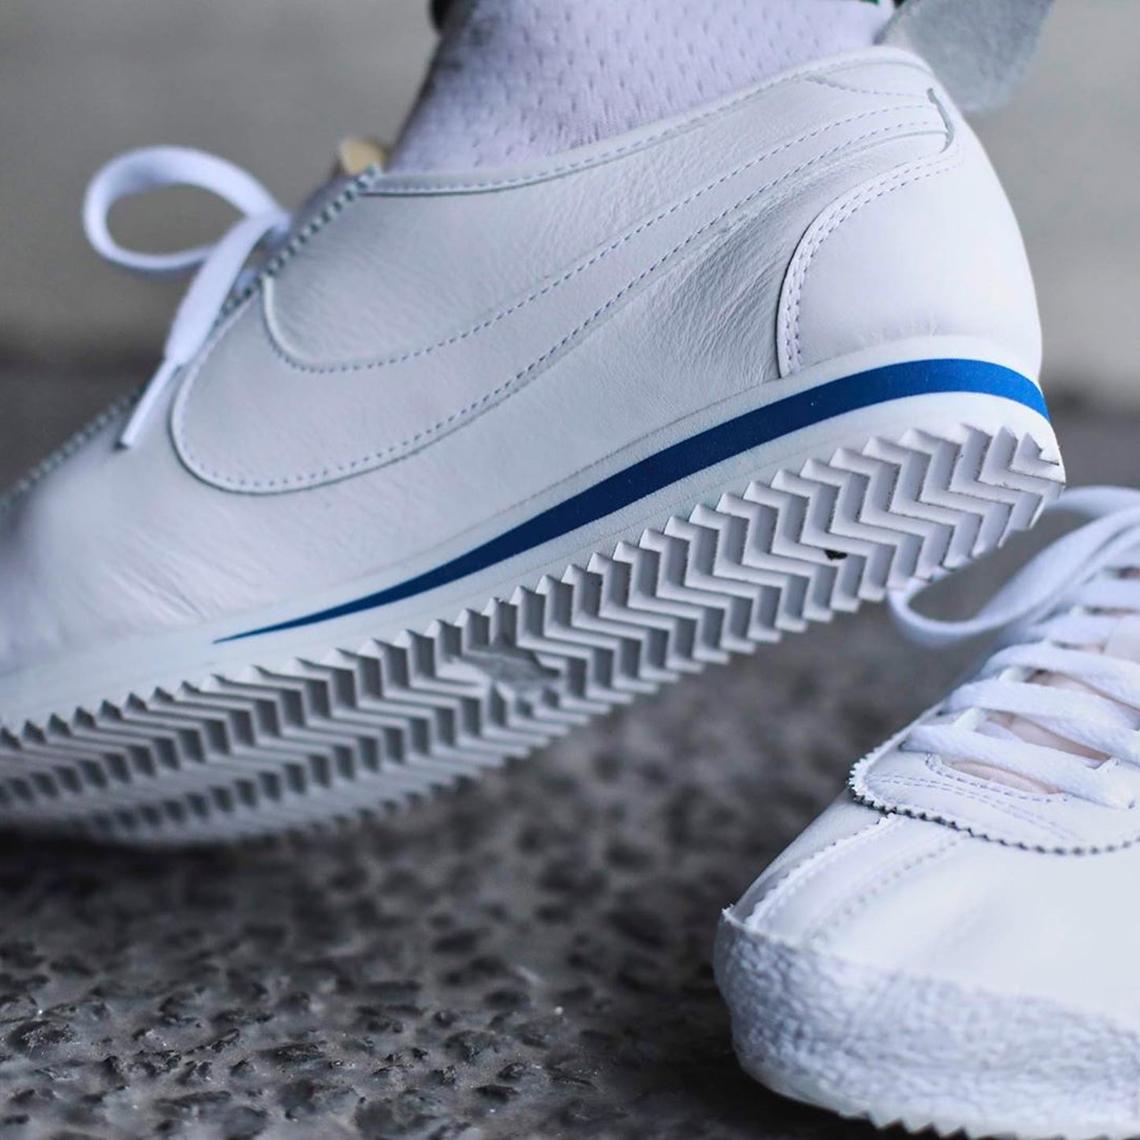 f:id:sneakerscaffetokyo:20190721063029j:plain